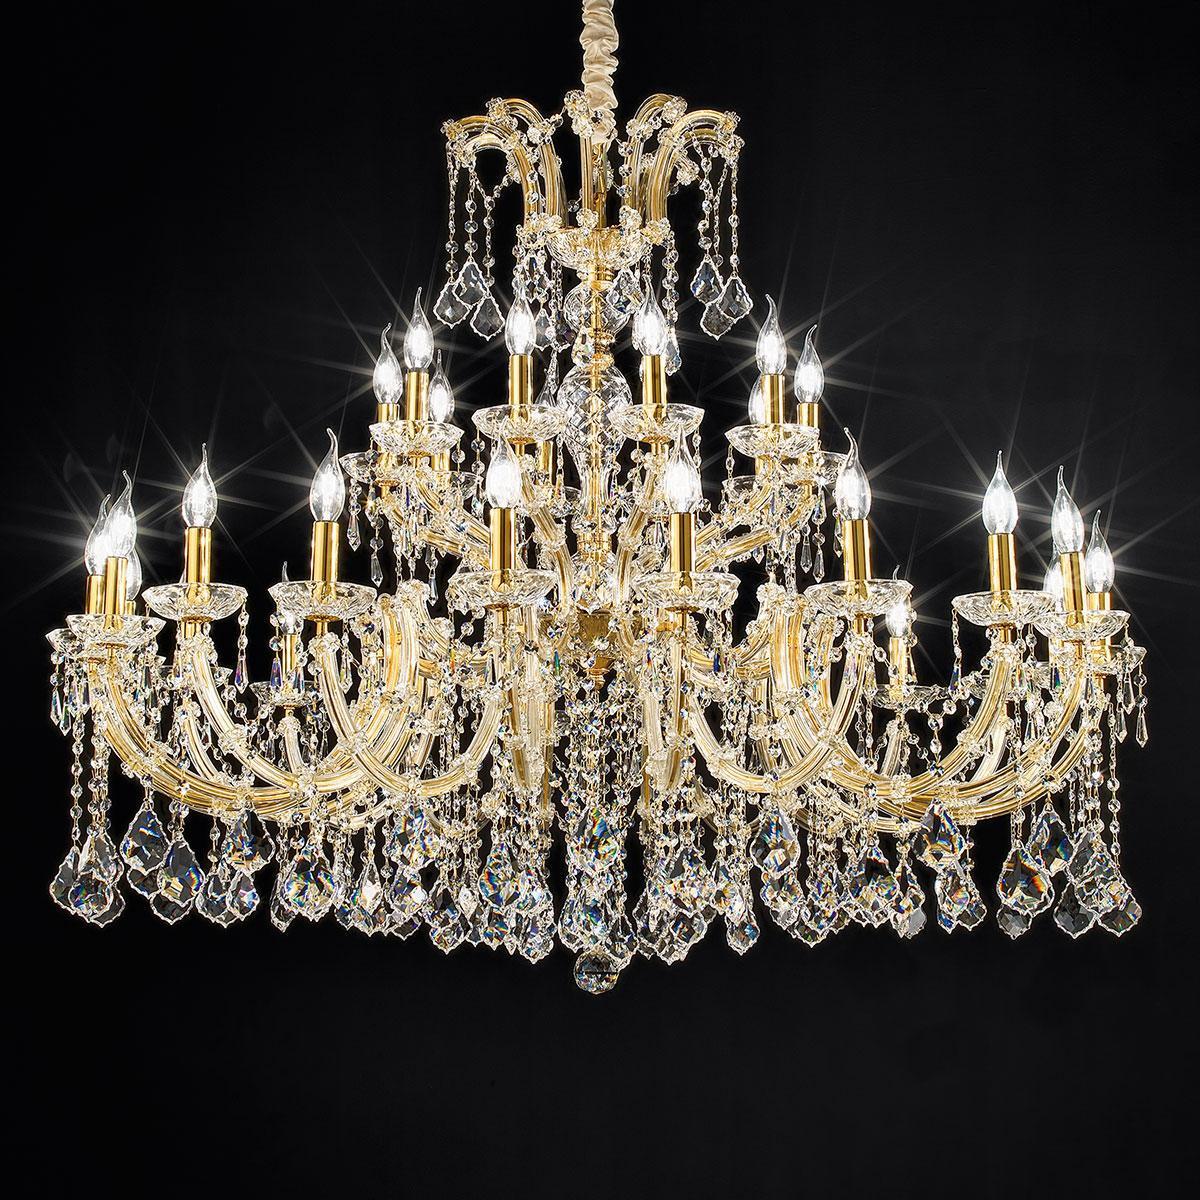 """Spilimbergo"" venezianischer kristall kronleuchter - 20+10 flammig - transparent mit kristal Asfour"